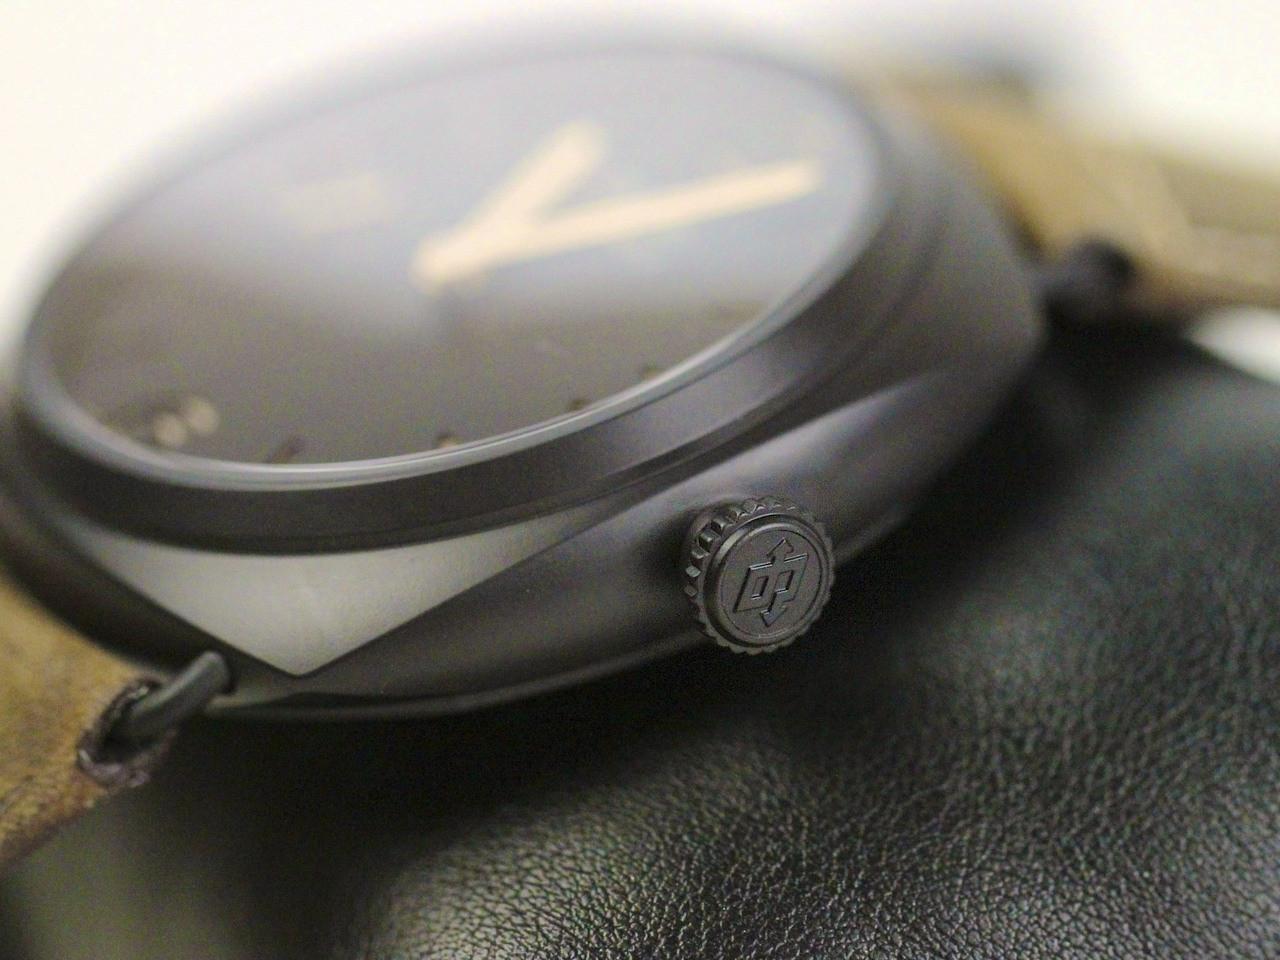 Crown & Case - New Panerai Watch - Radiomir Composite 3 Days PAM 504 www.Legendoftime.com - Chicago Watch Center